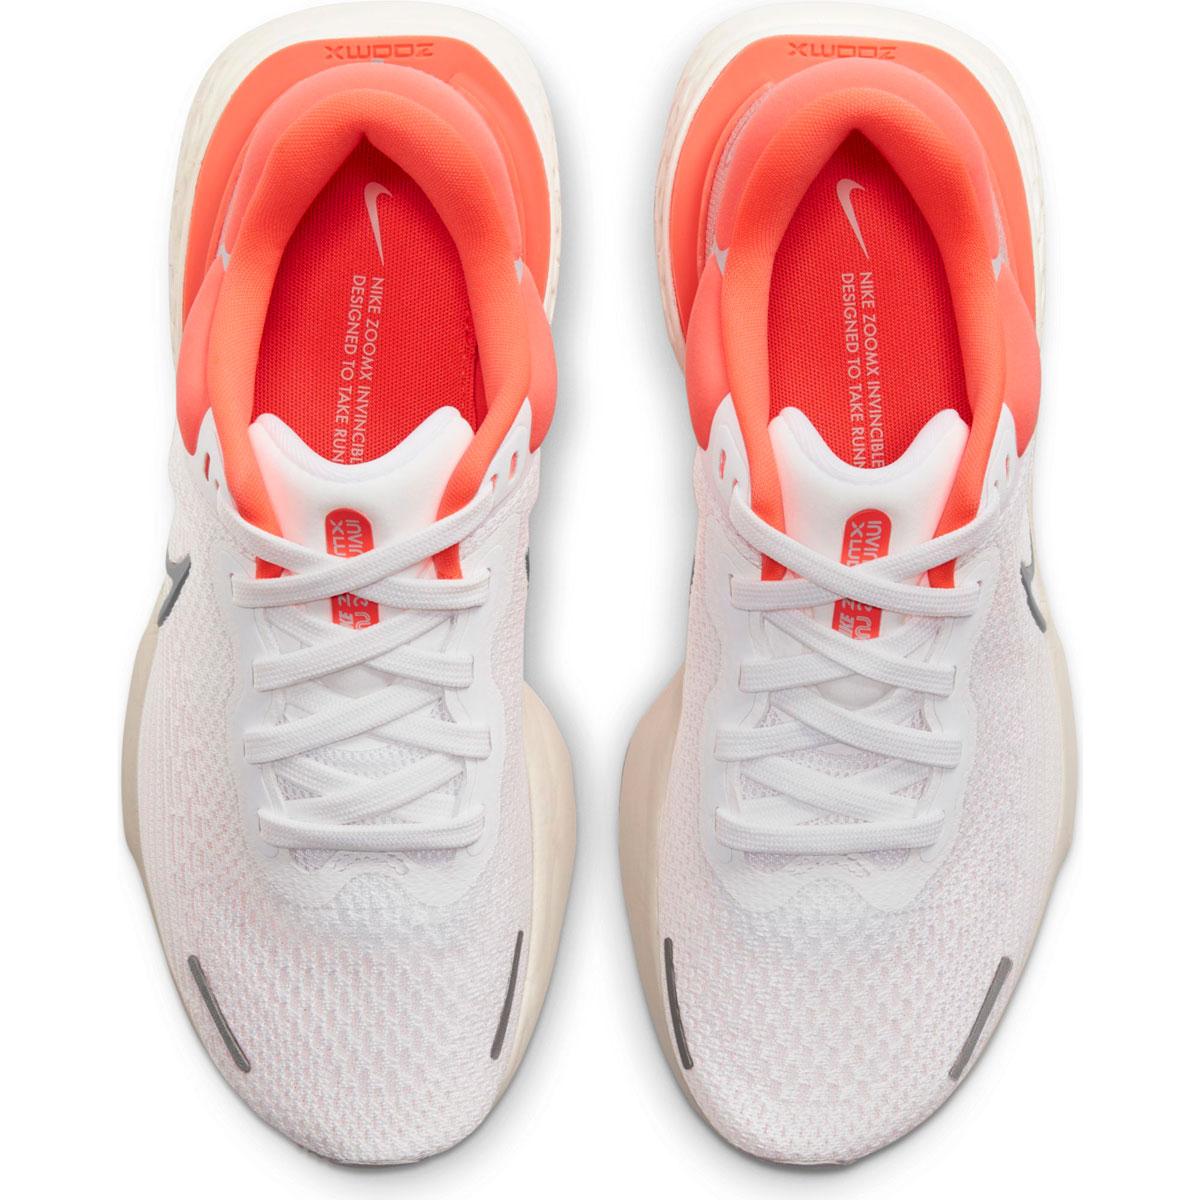 Women's Nike Zoomx Invincible Run FlyKnit Running Shoe - Color: White/Metallic Silver/Bright Mango - Size: 5 - Width: Regular, White/Metallic Silver/Bright Mango, large, image 3